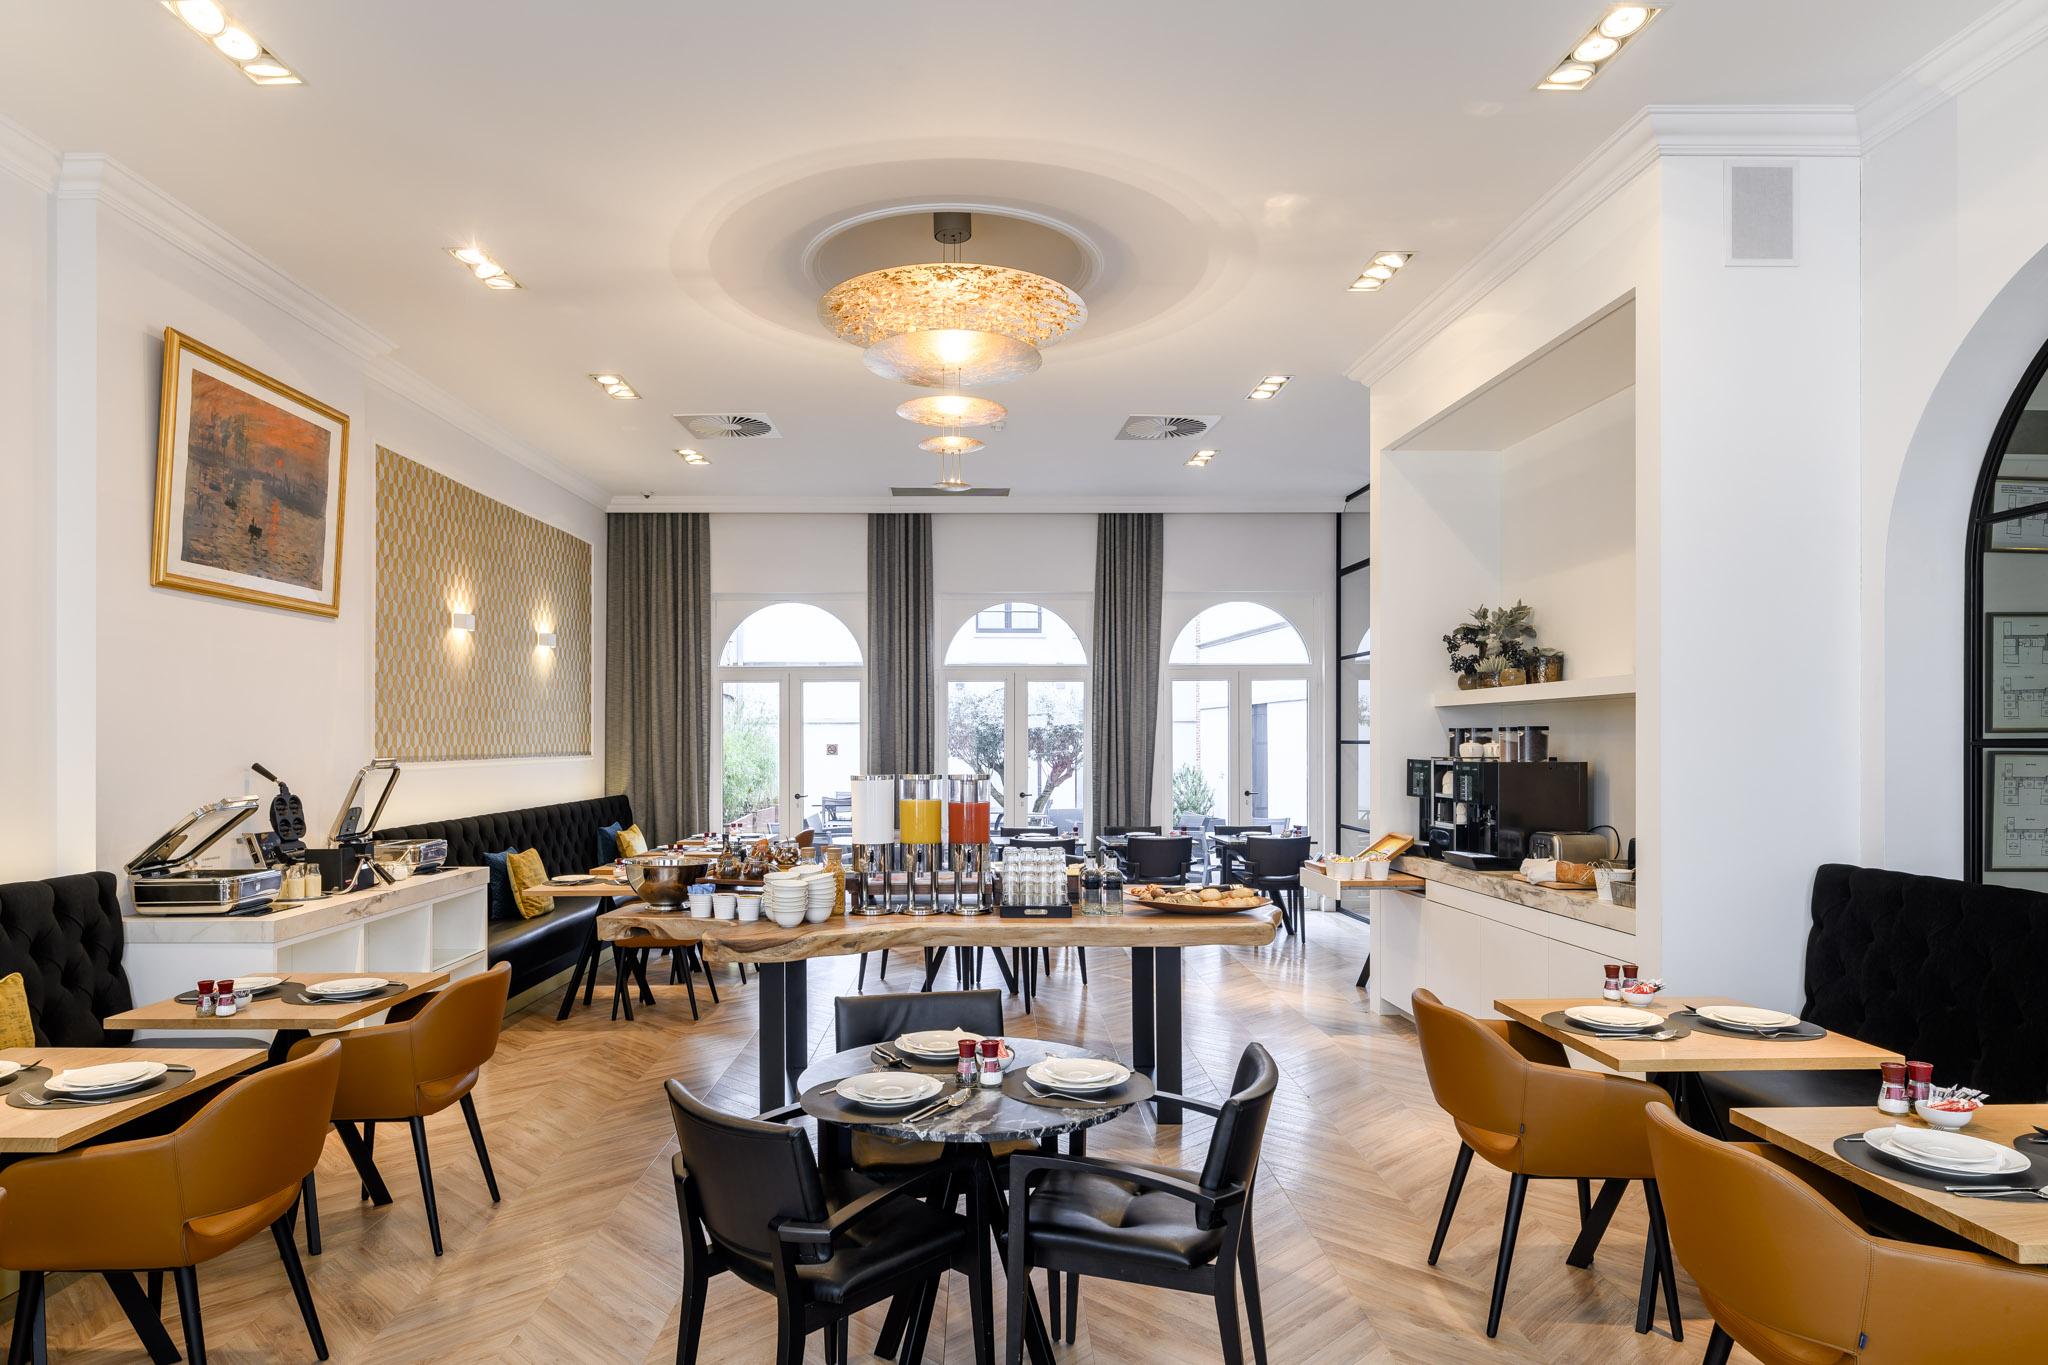 Grote Side Table.Hotel Rubens Grote Markt Antwerpen Oude Beurs29